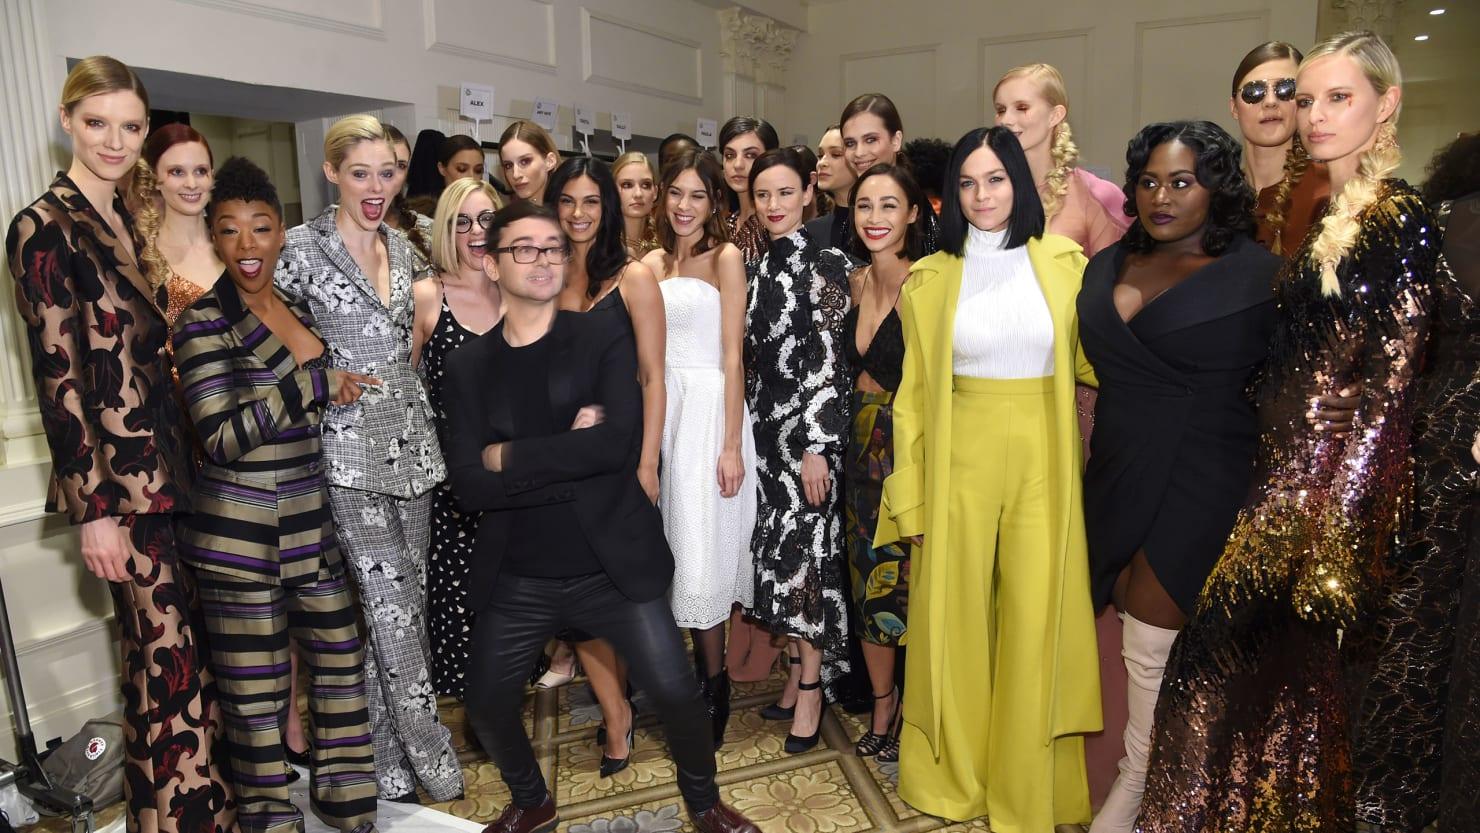 Tiffany Trump And Marla Maples Hit New York Fashion Week Secret Jfashion Korean Style Double Layer Blouse Ivanka Service Included